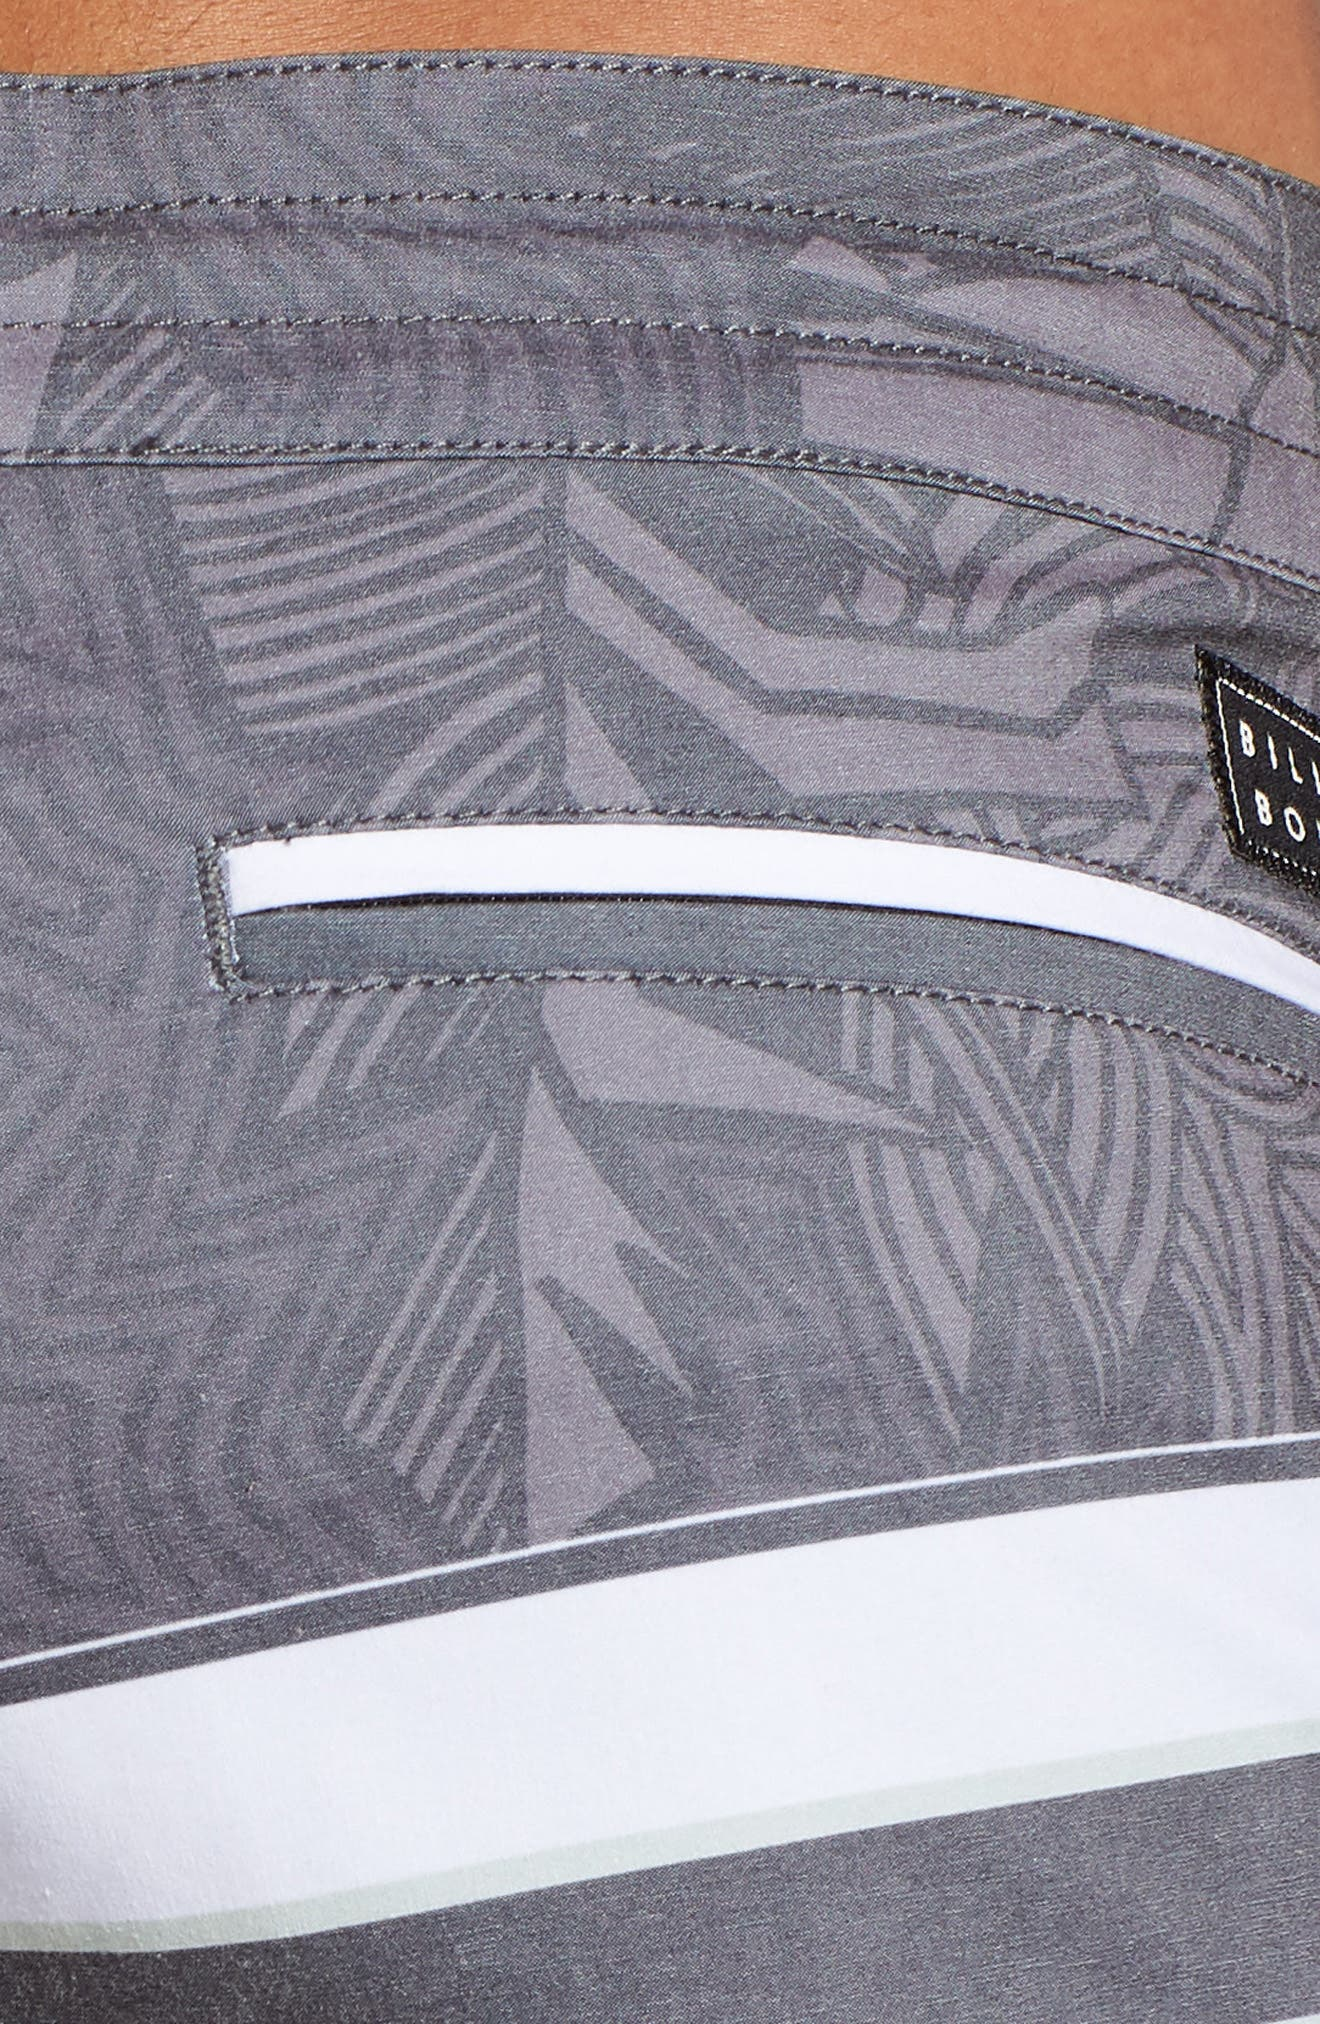 Stringer Lo Tides Board Shorts,                             Alternate thumbnail 5, color,                             001